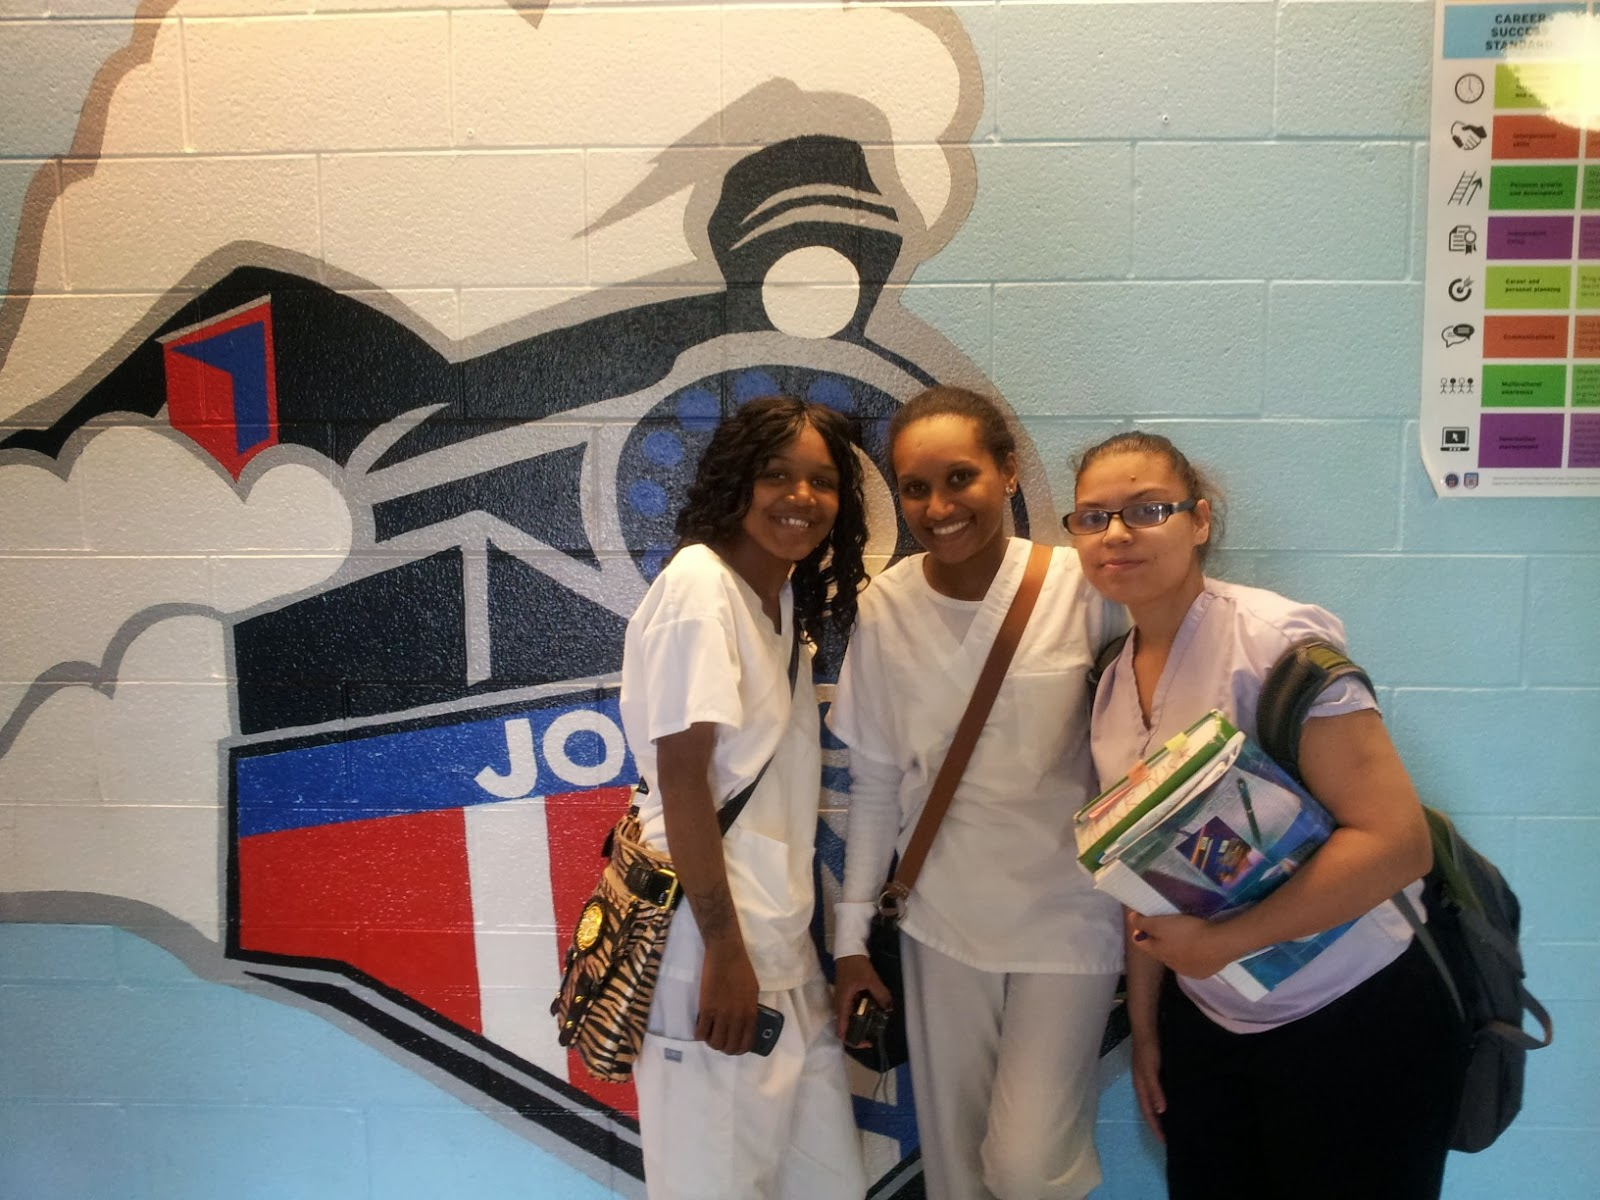 chicago job corps